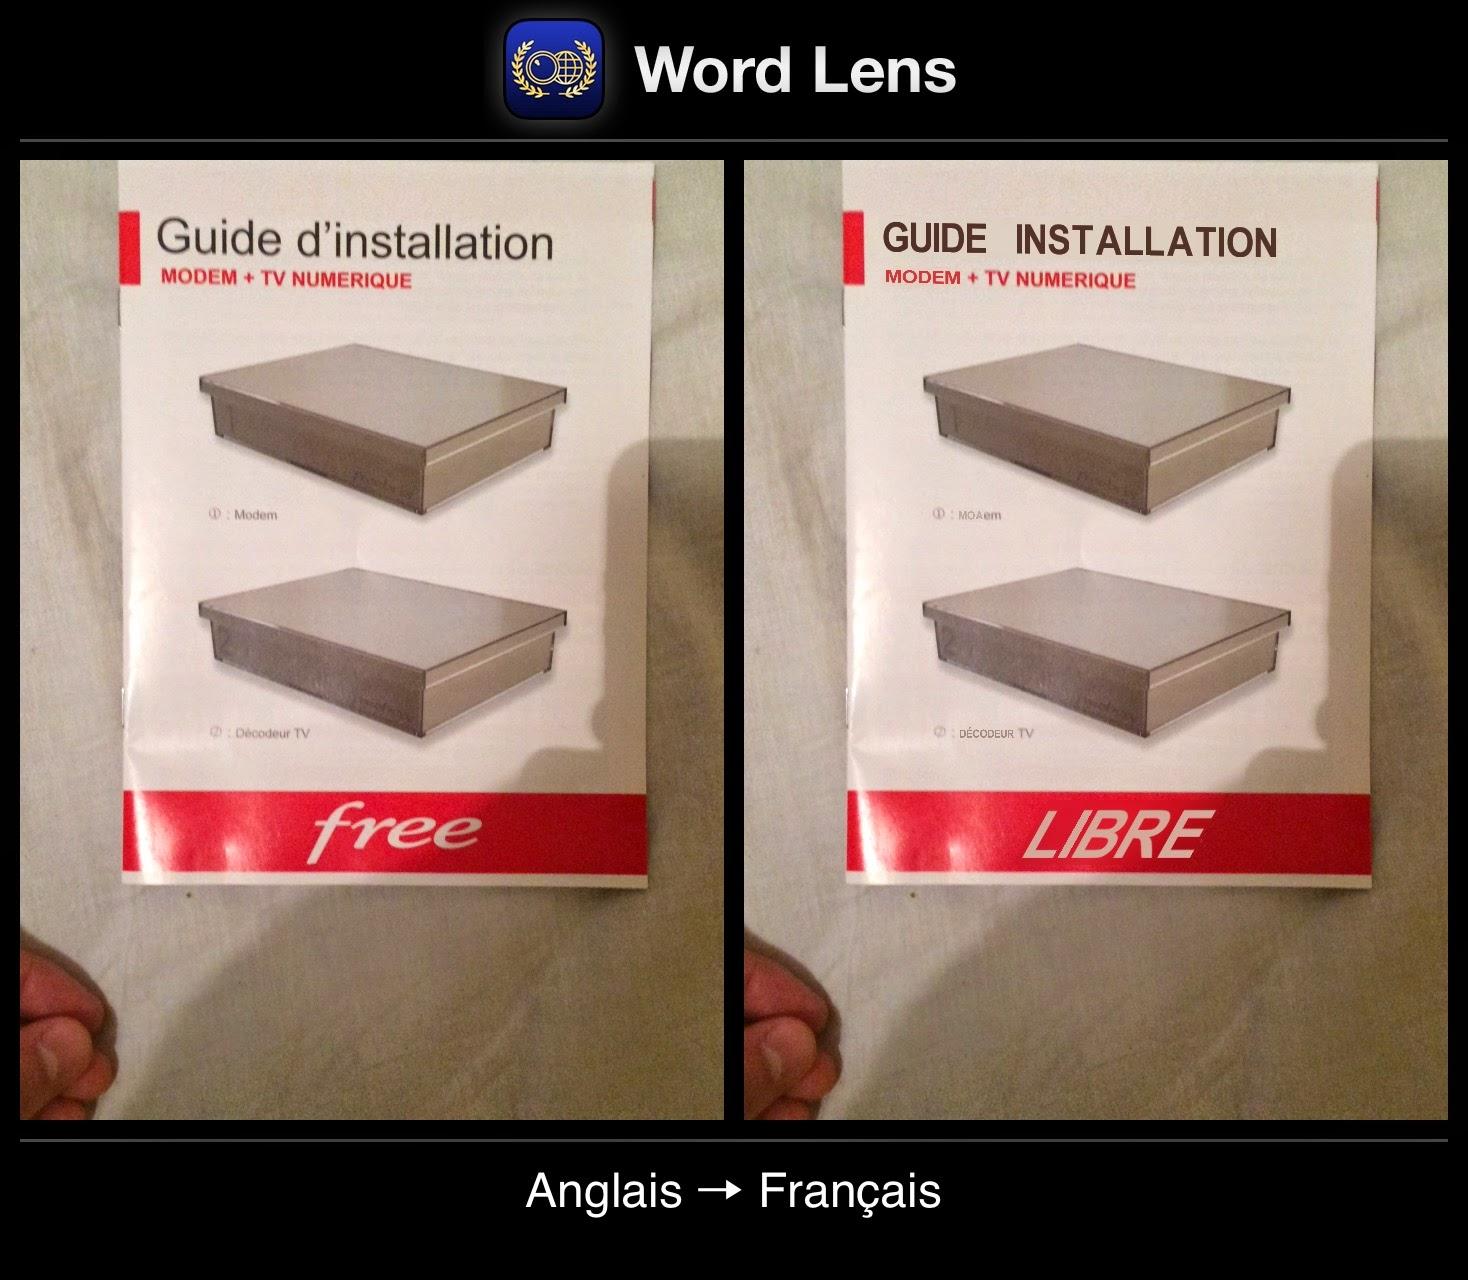 word lens app esteban applications